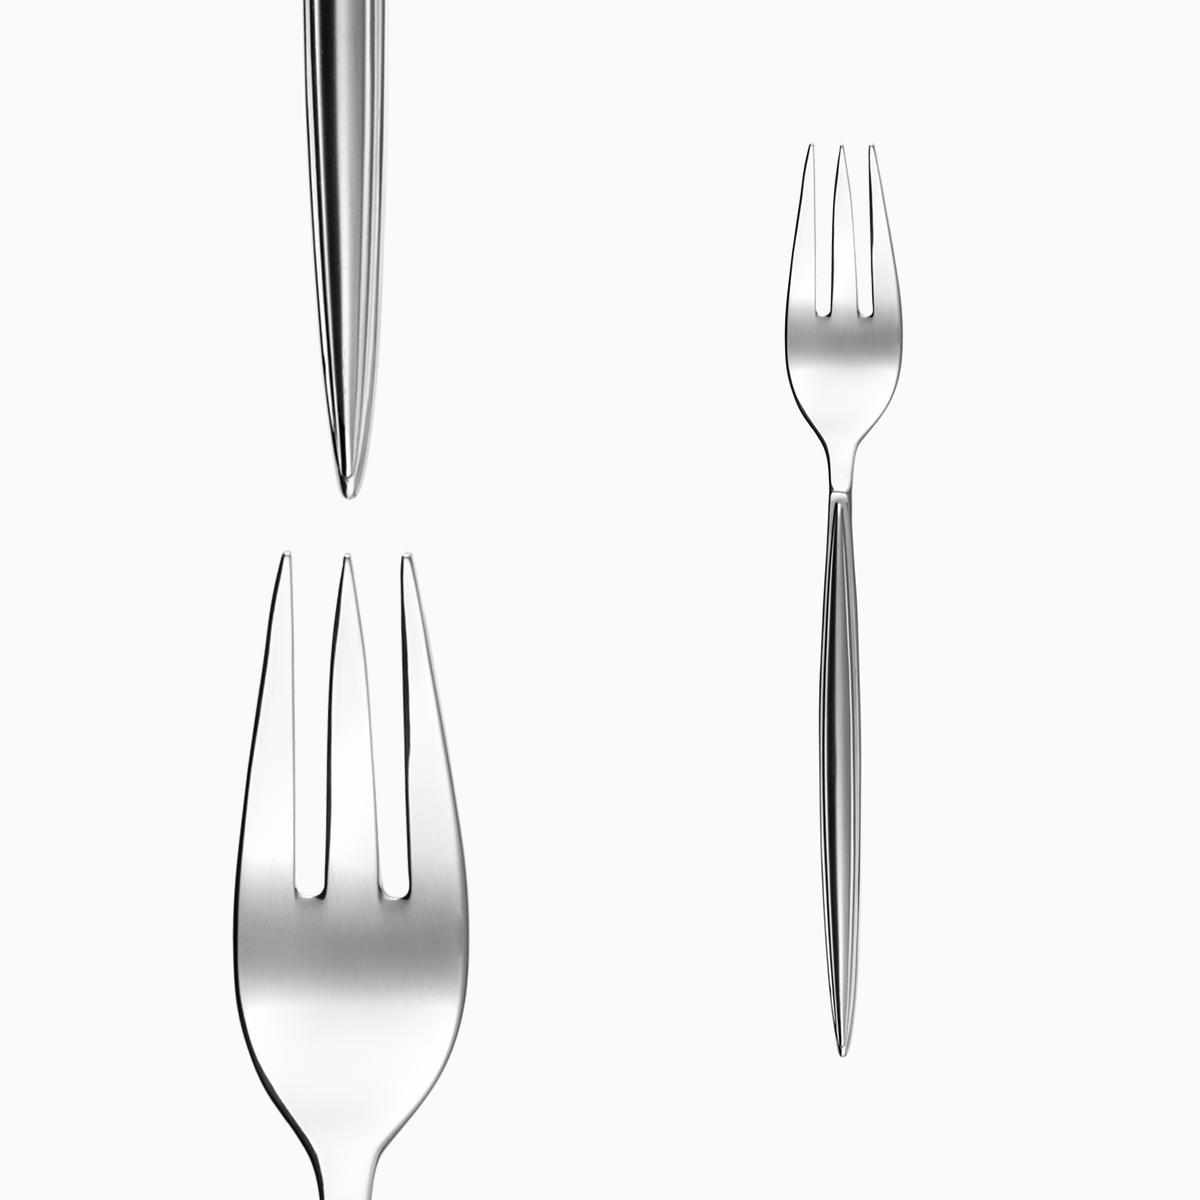 Fish fork - Montevideo sandblast